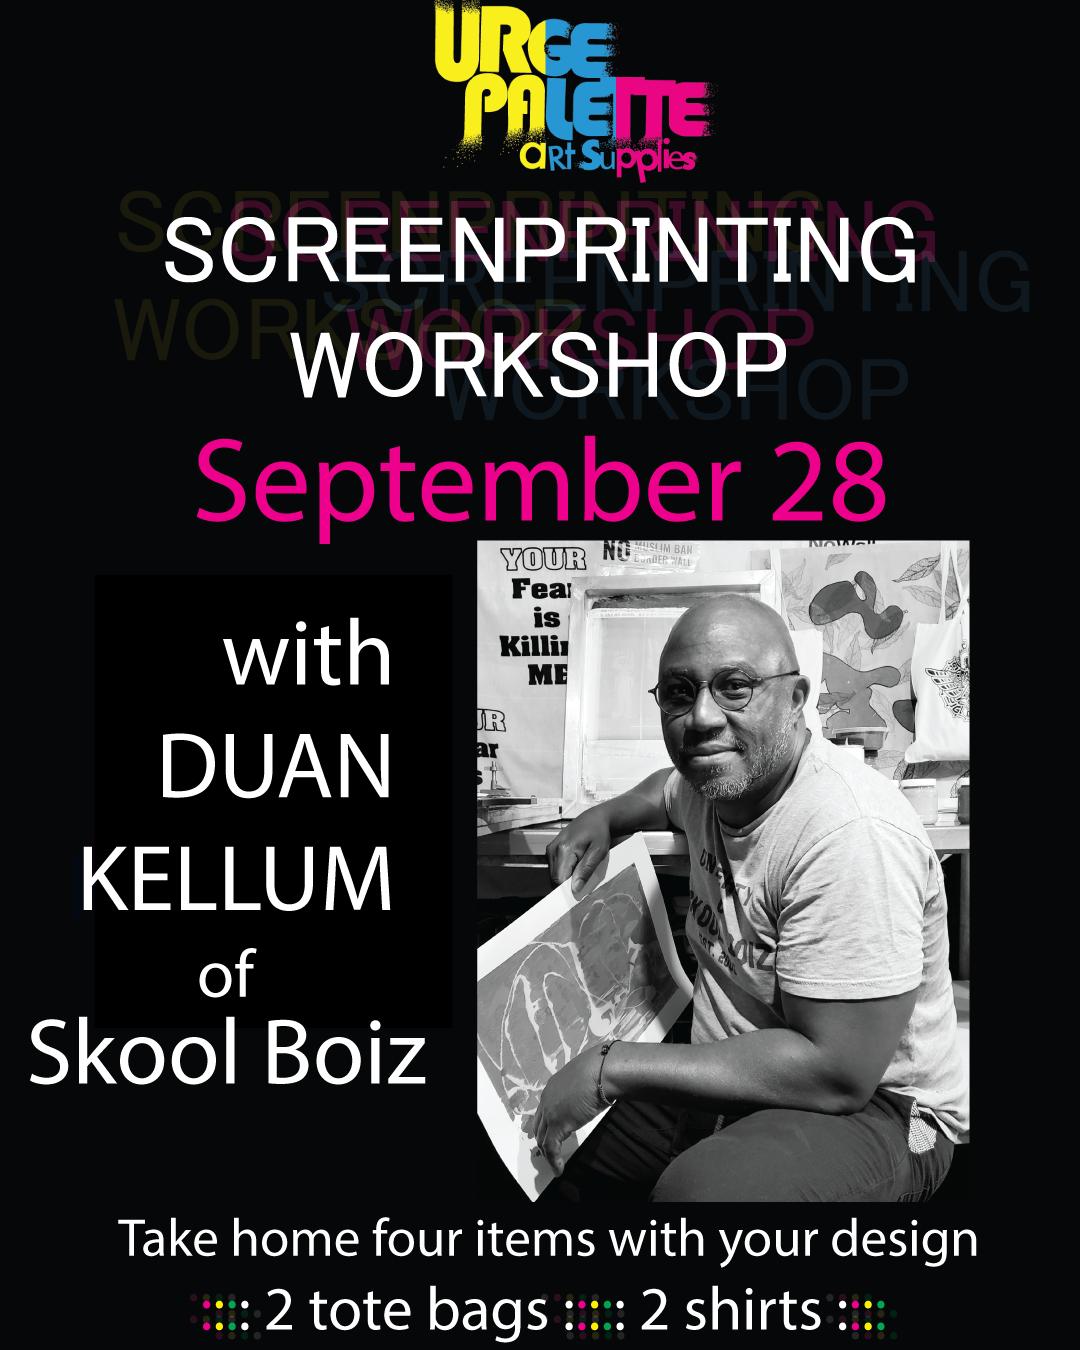 screenprintinginsta